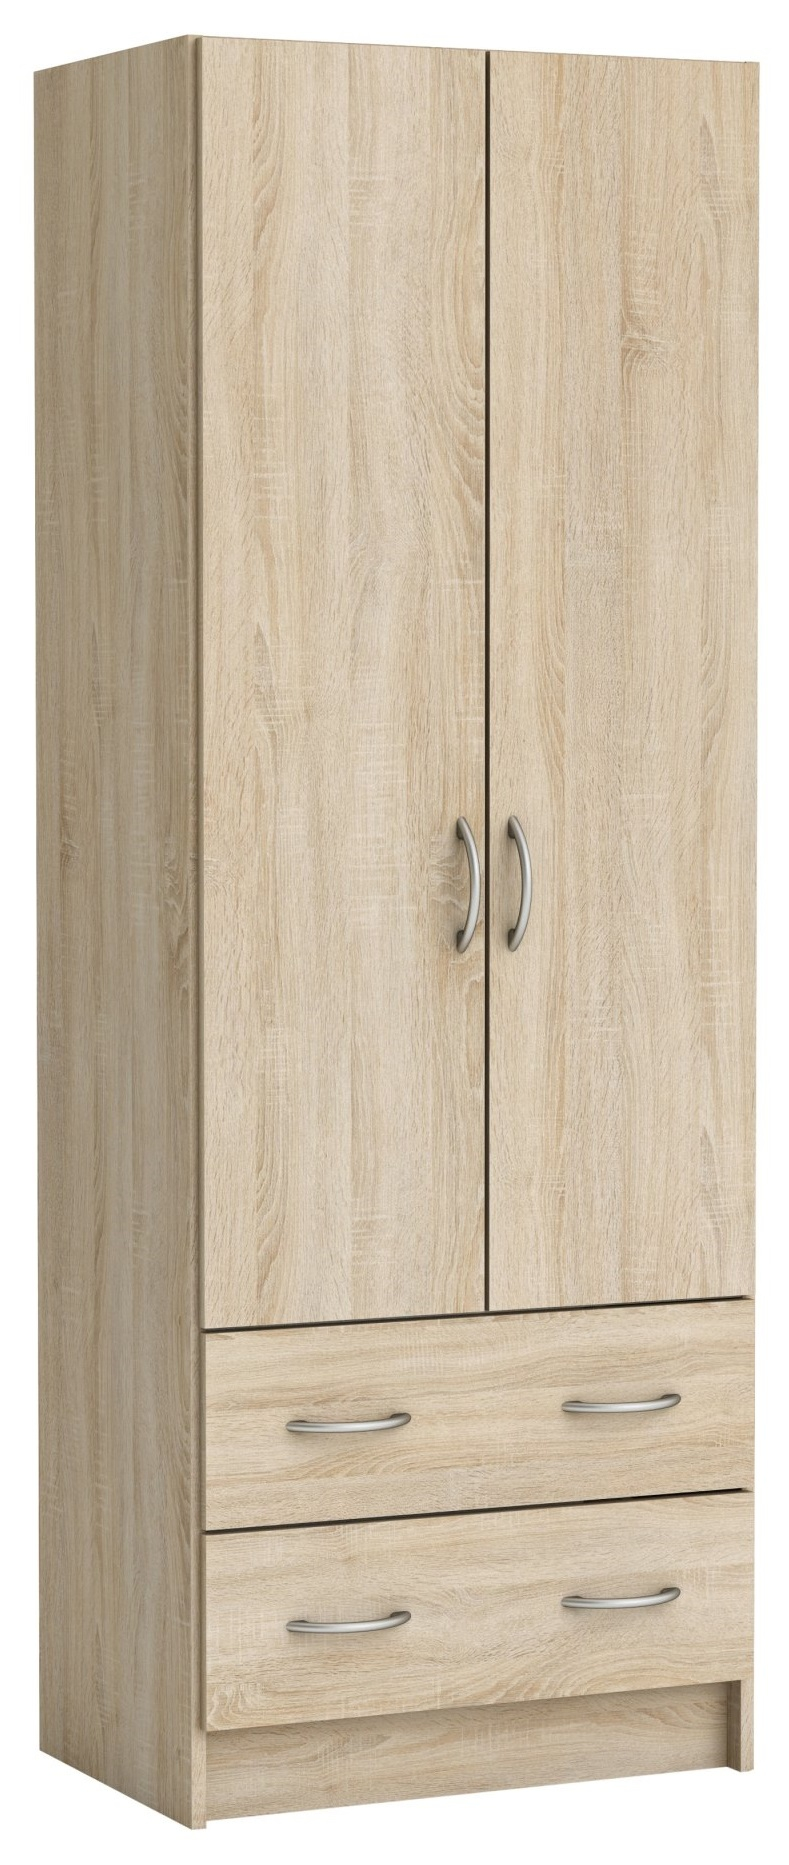 Kledingkast Linen 60 cm breed in geborsteld eiken | Young Furniture